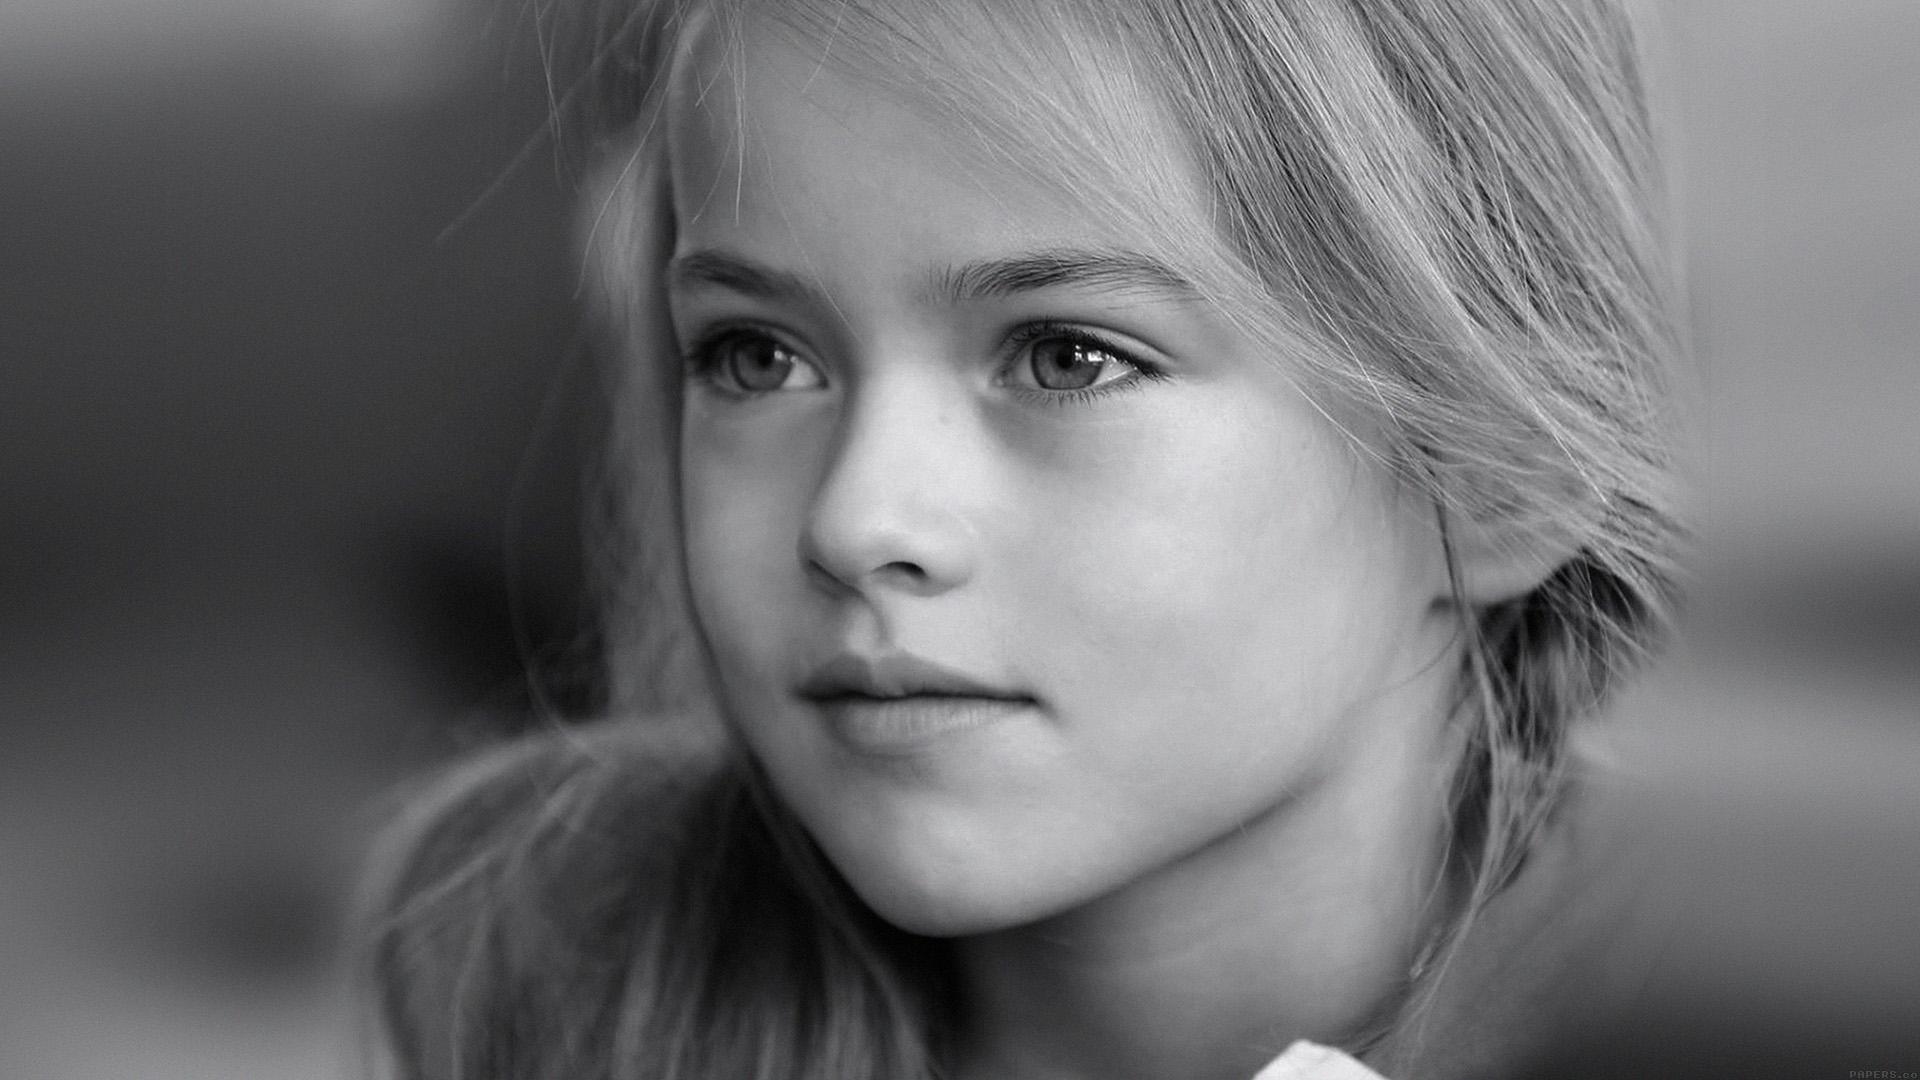 Fall Wallpaper Iphone 7 Plus Hd74 Kristina Pimenova Cute Girl Model Bw Dark Papers Co